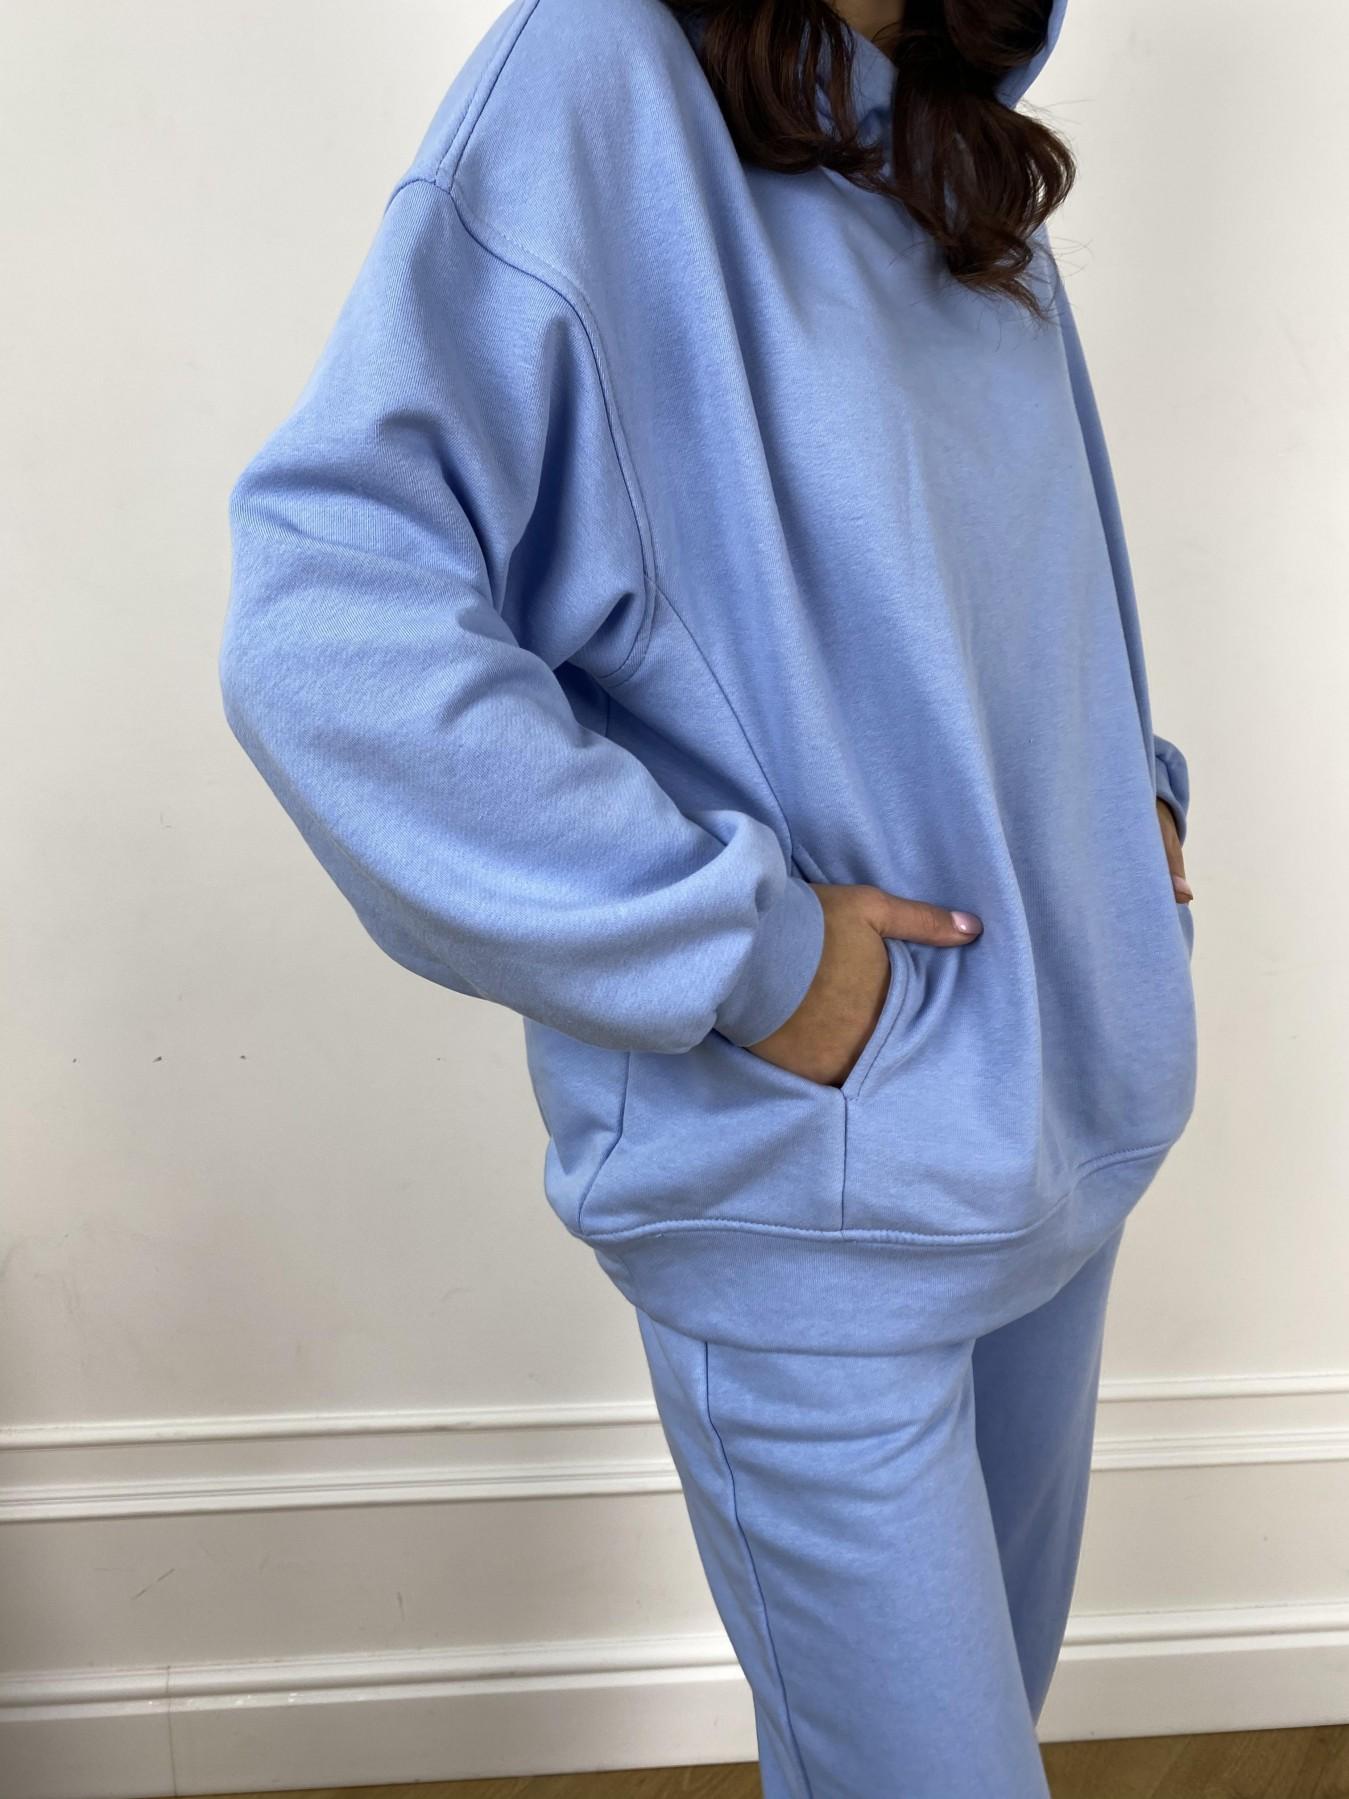 Марион костюм из 3х нитки 10581 АРТ. 46937 Цвет: Голубой - фото 7, интернет магазин tm-modus.ru